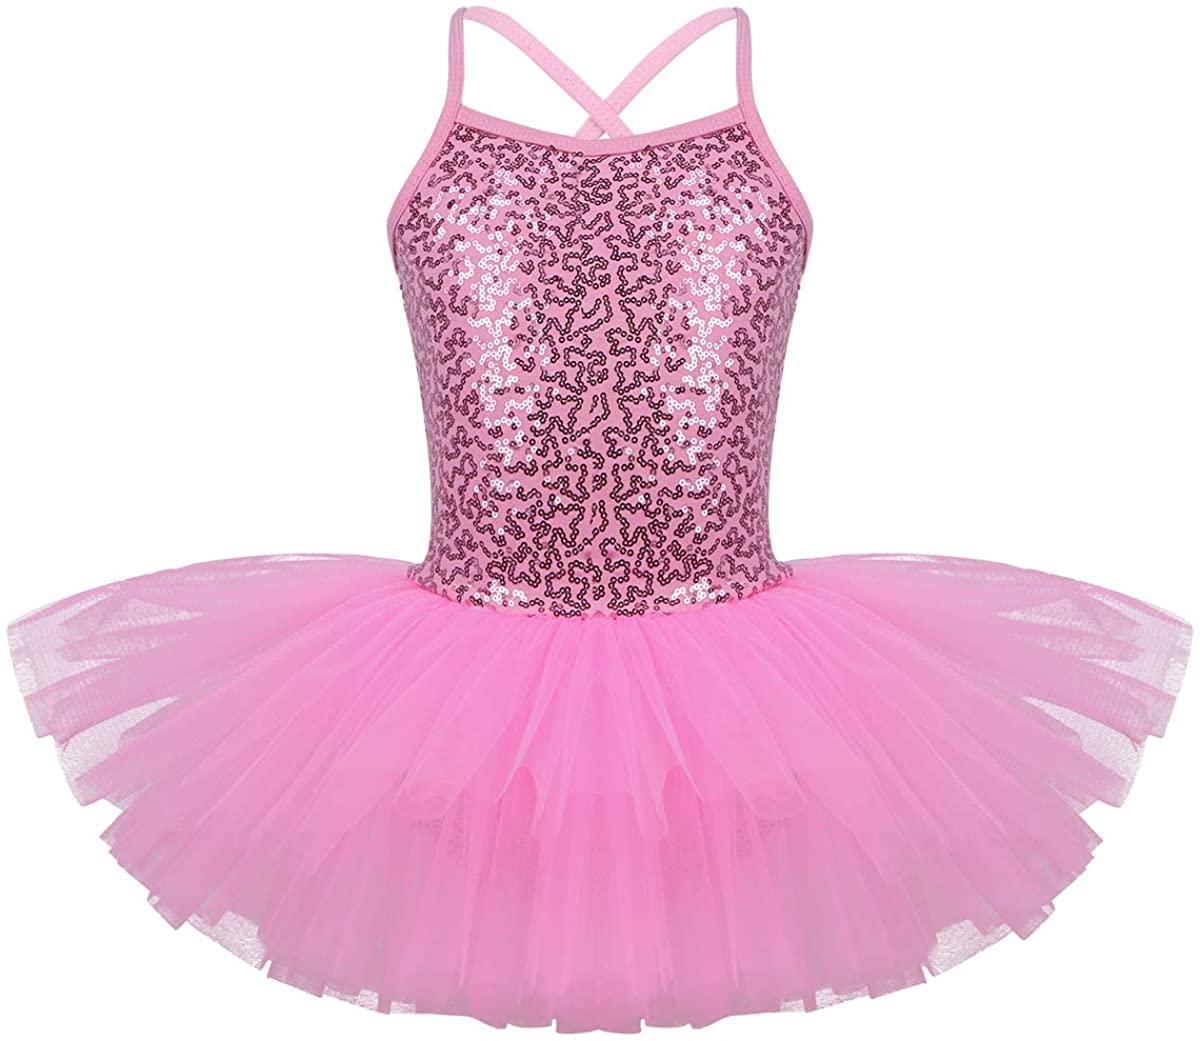 Nimiya Kids Grils Shiny Sequined Criss Cross Back Ballet Dance Tutu Dress Gymnastics Leotard Workout Dance Wear Costume